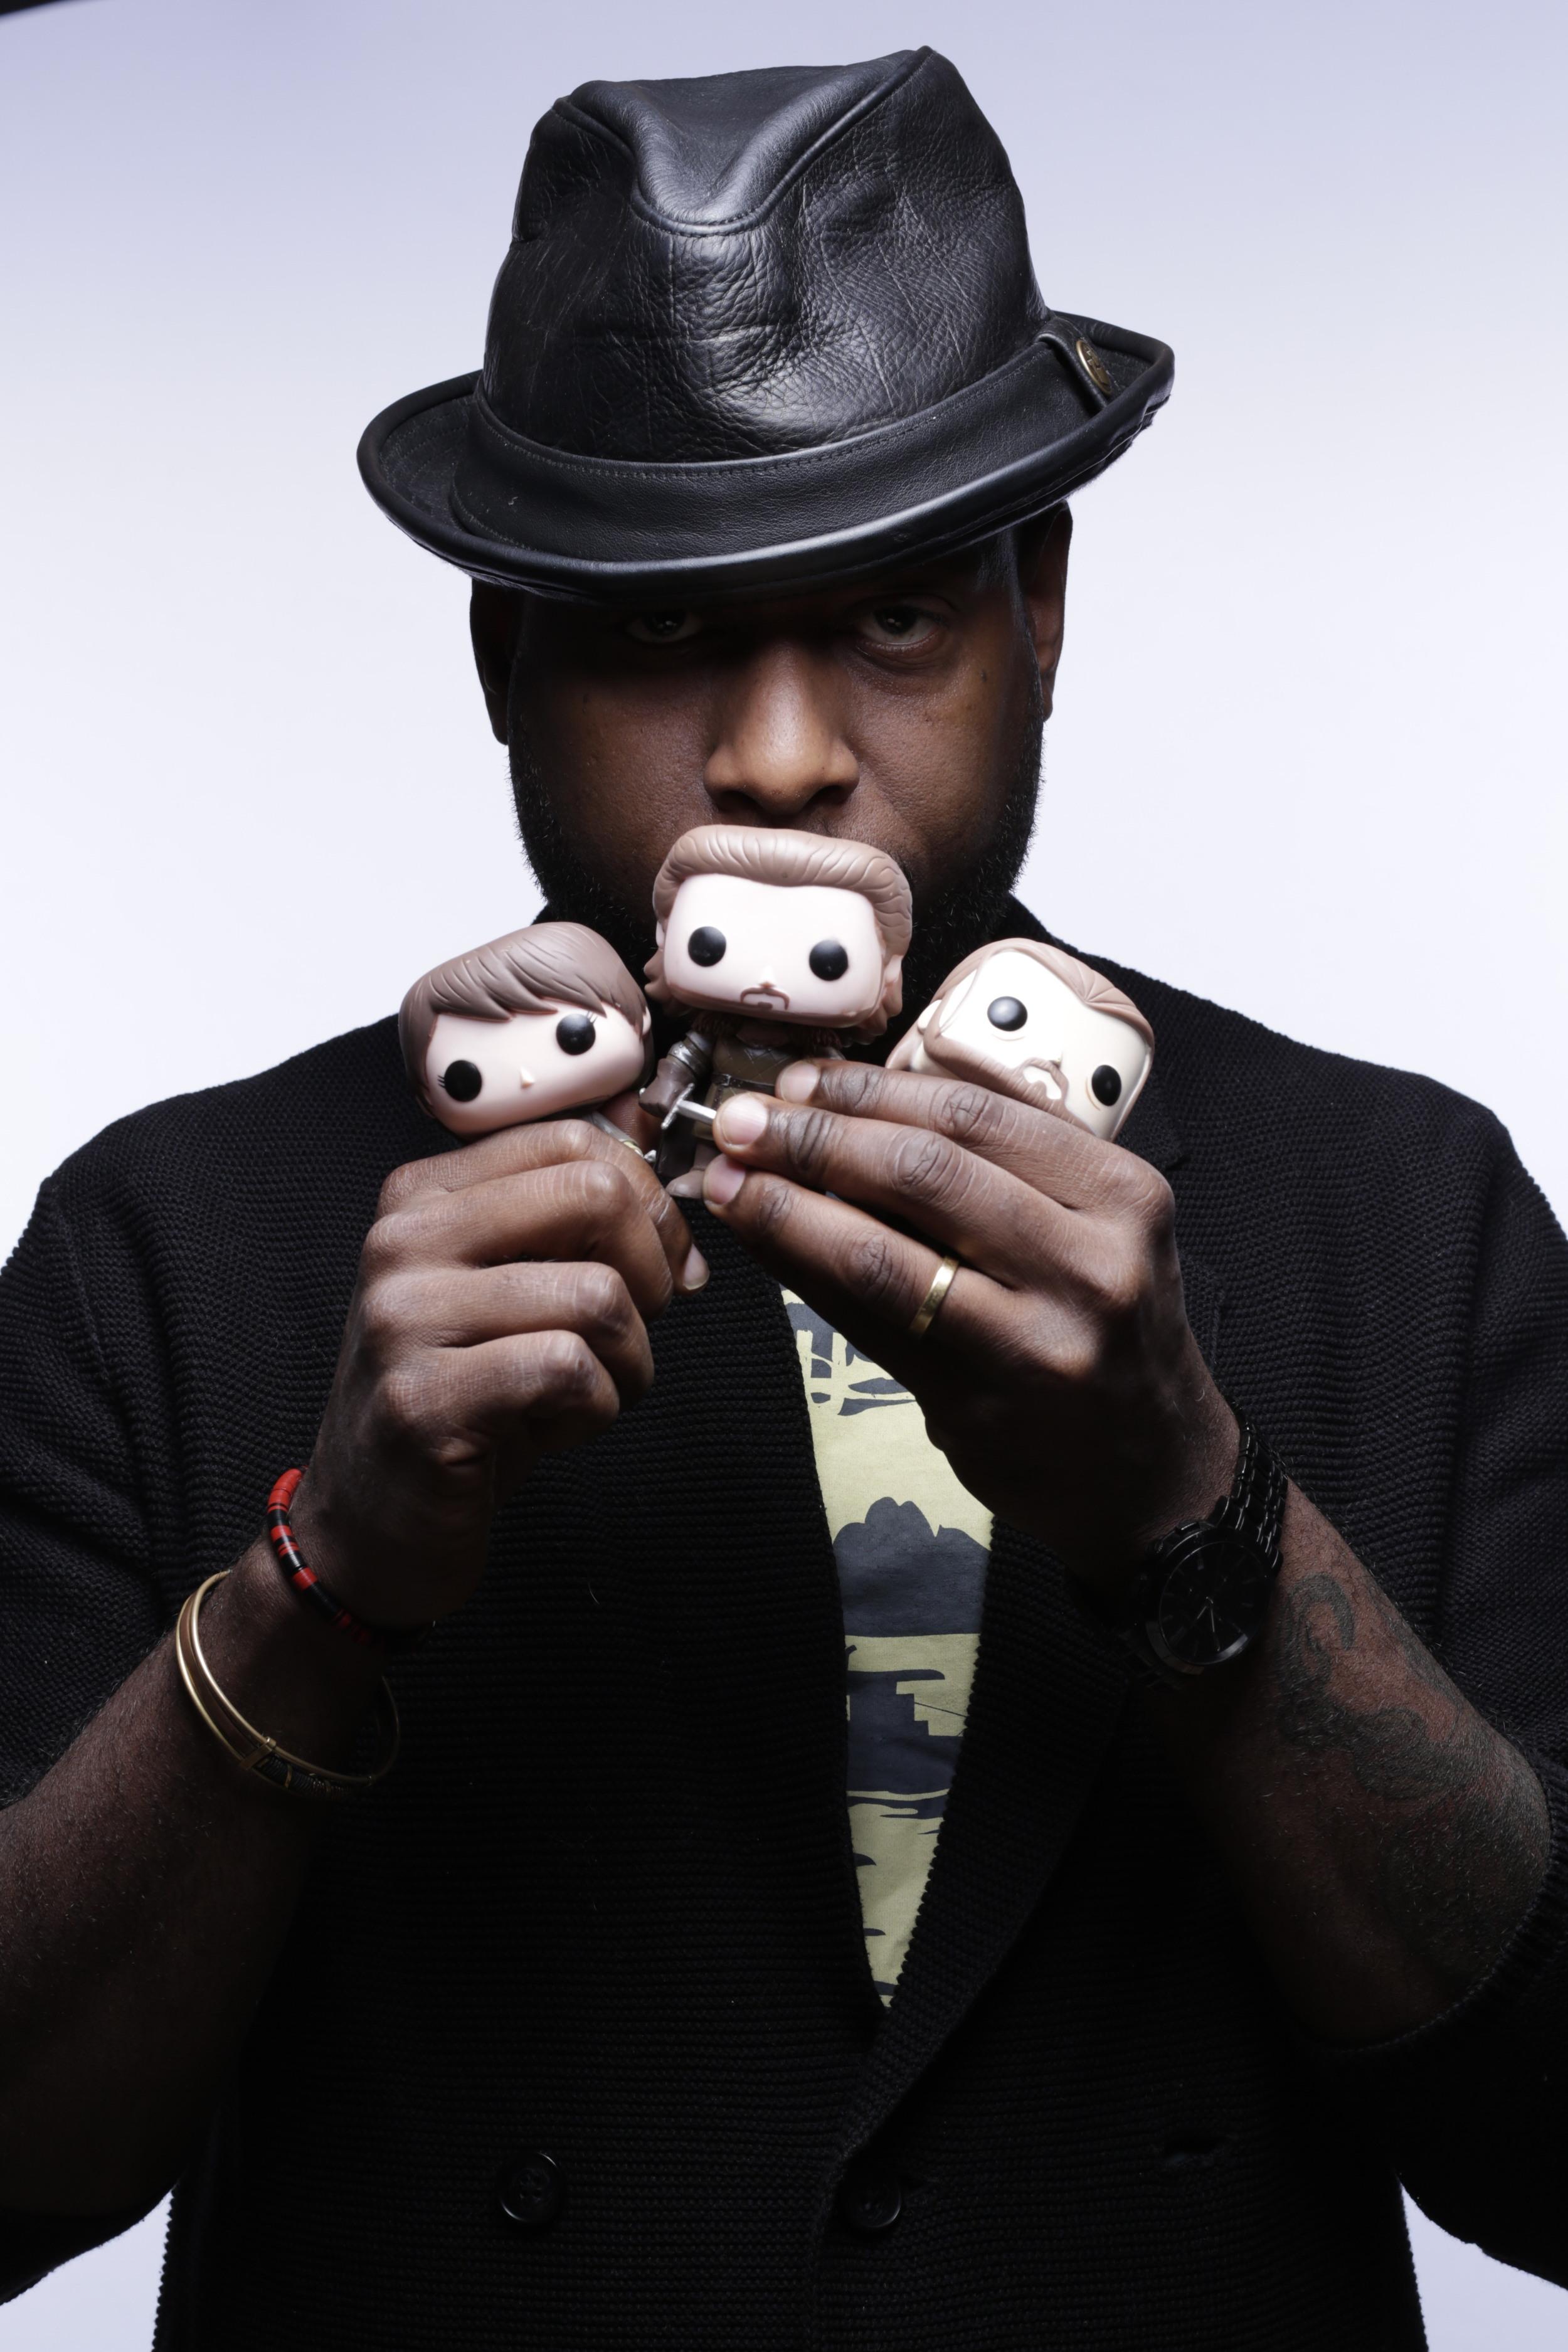 Talib Kweli poses with the GOT Funko dolls.